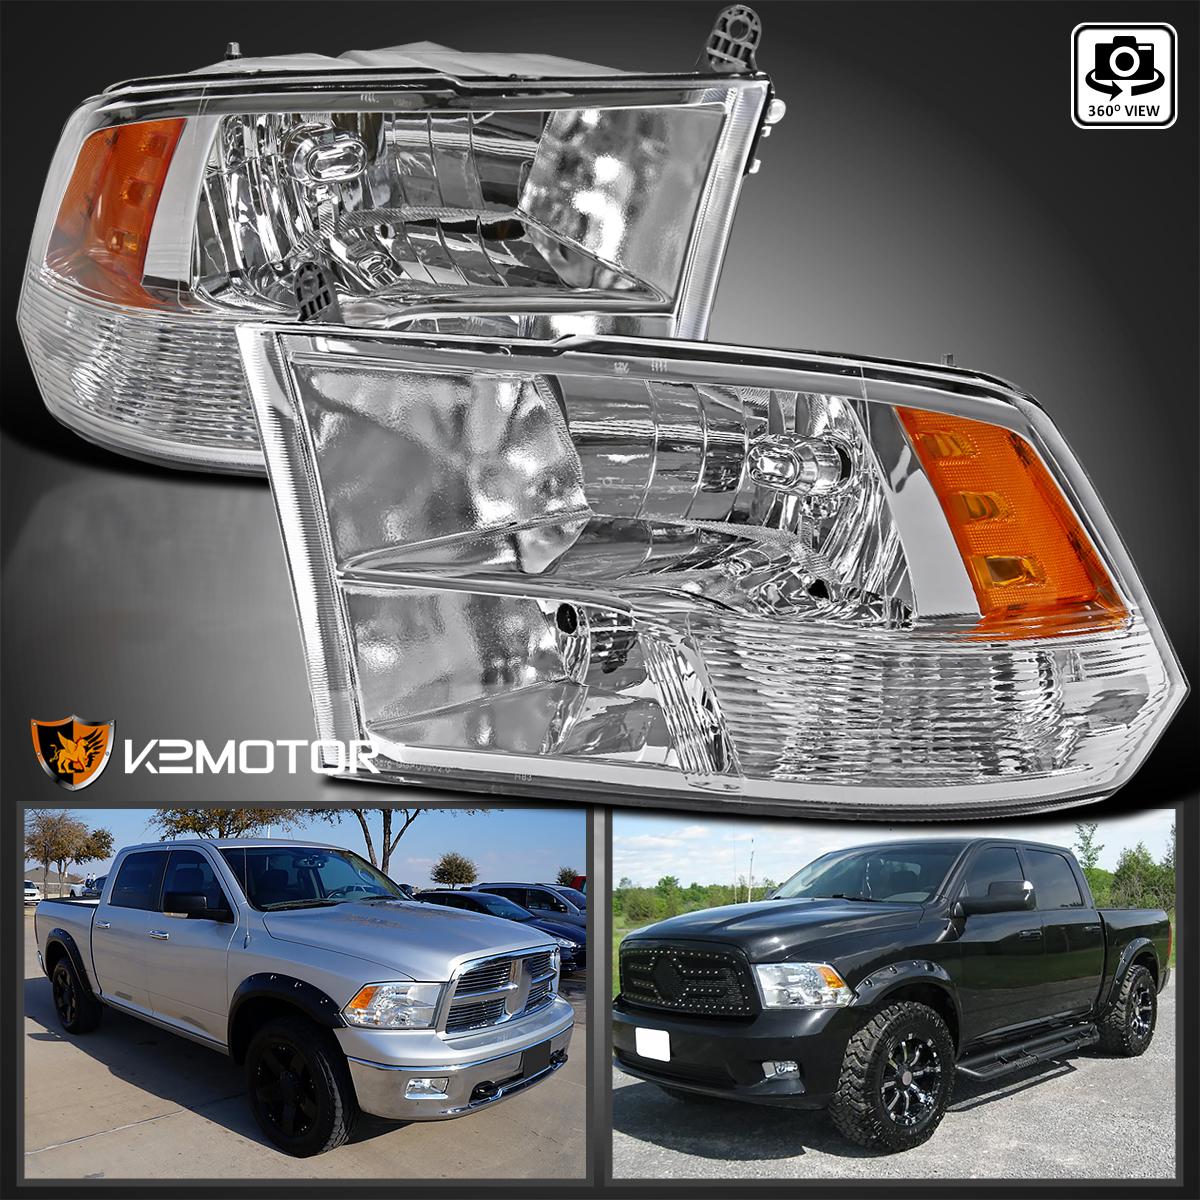 2009-2017 Dodge Ram 1500/2500/3500 Crystal Quad Headlights